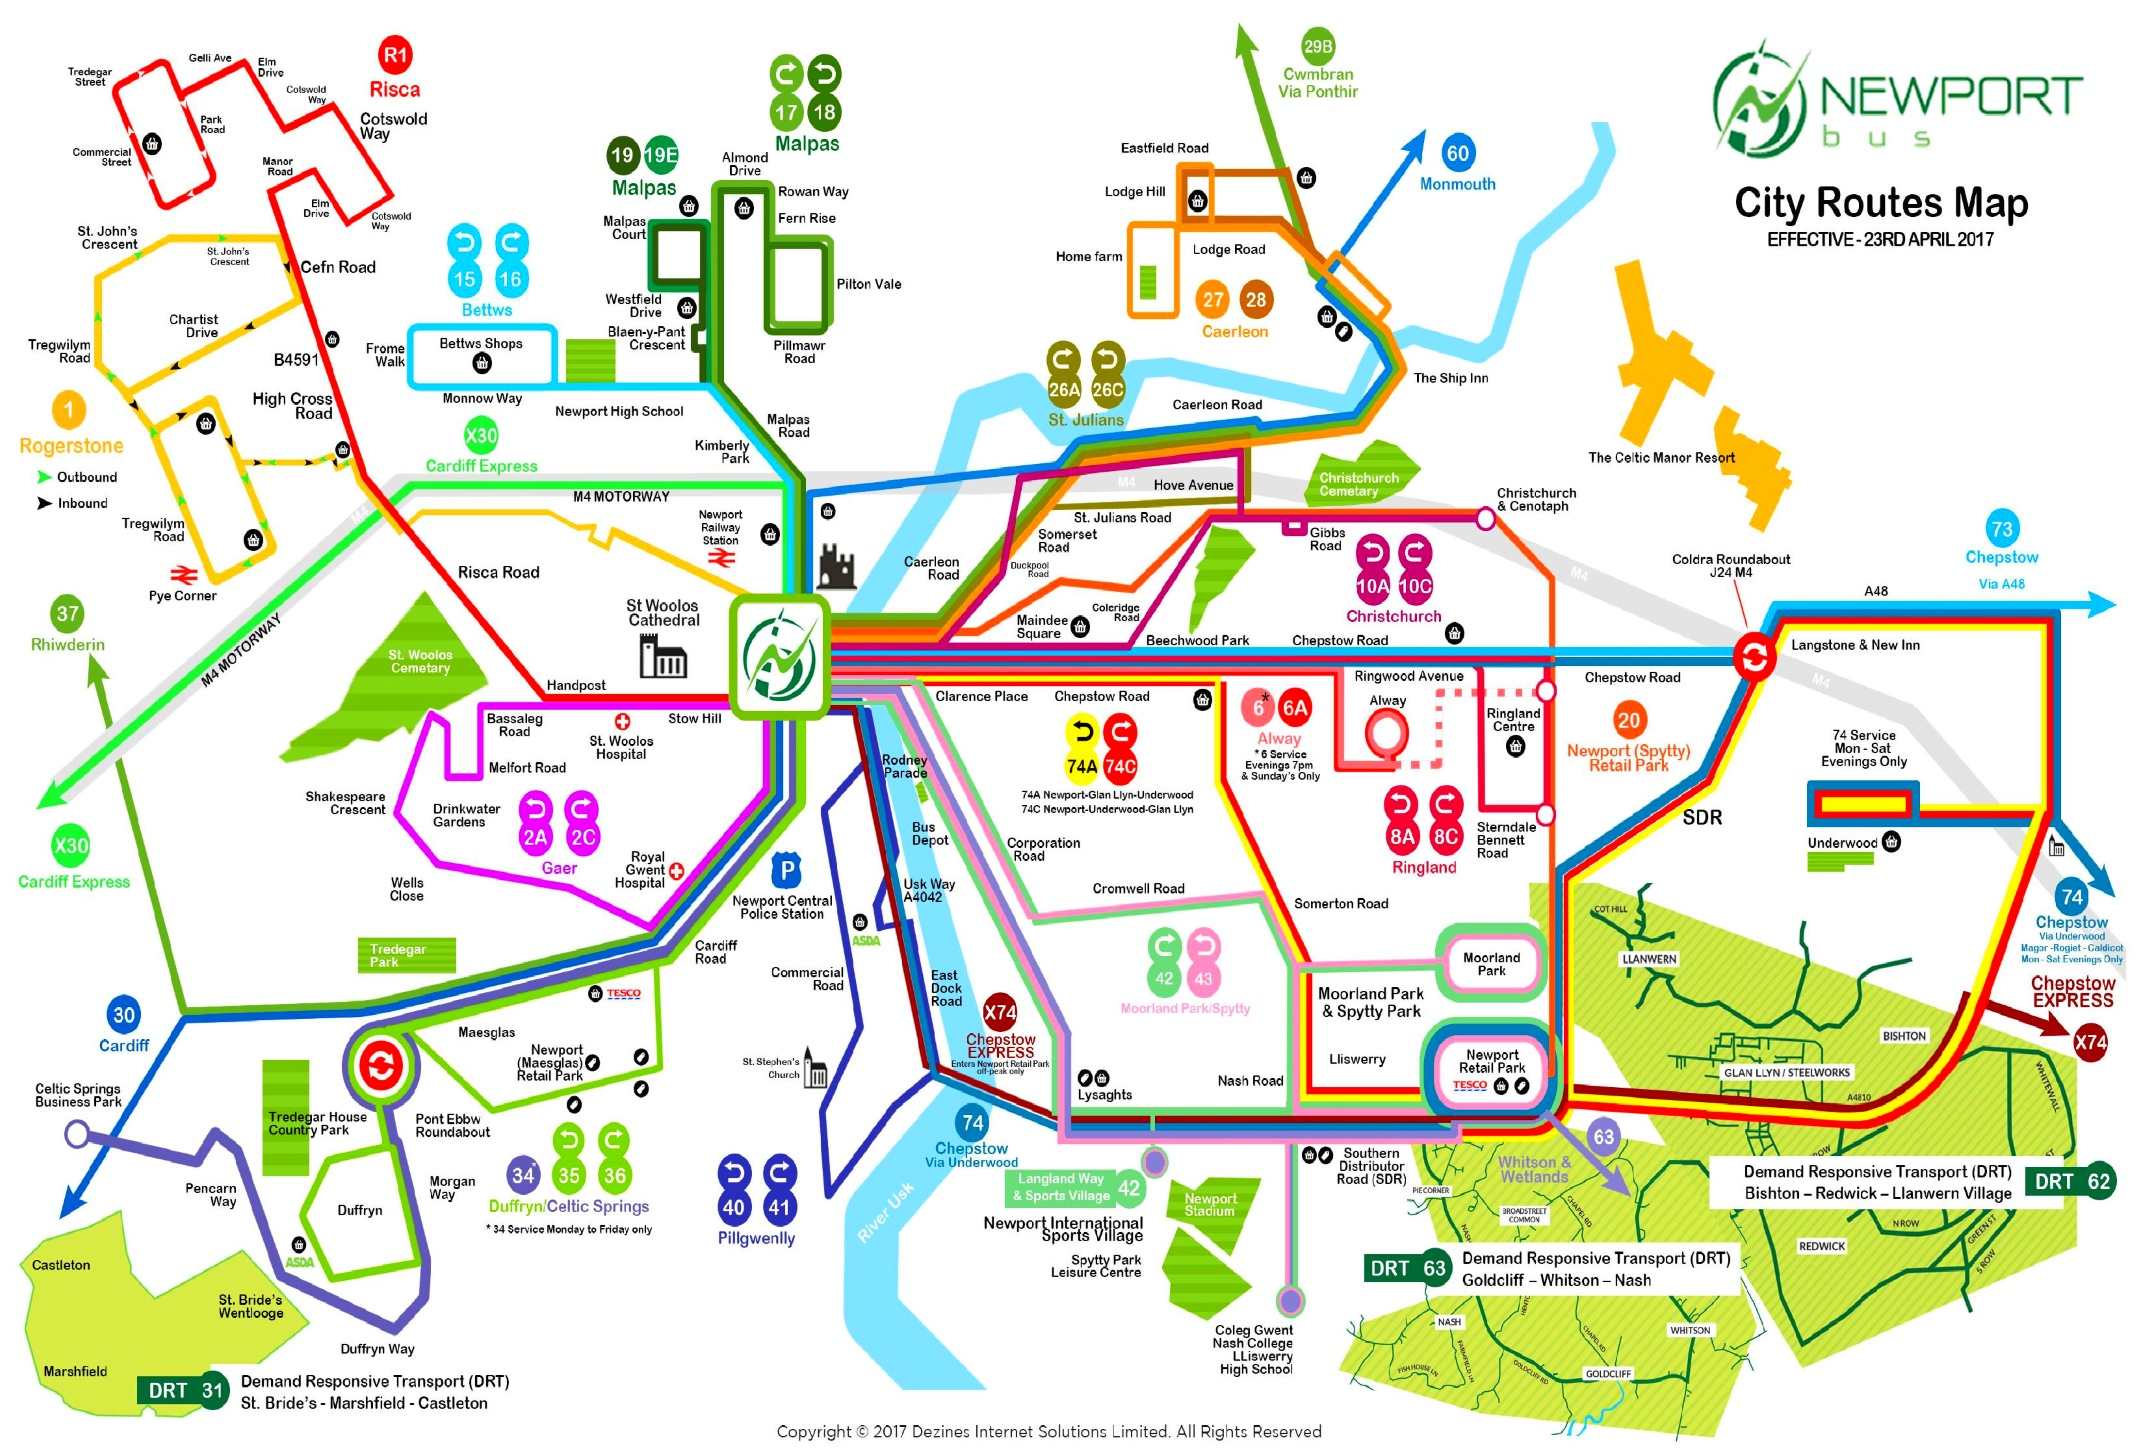 Newport bus map